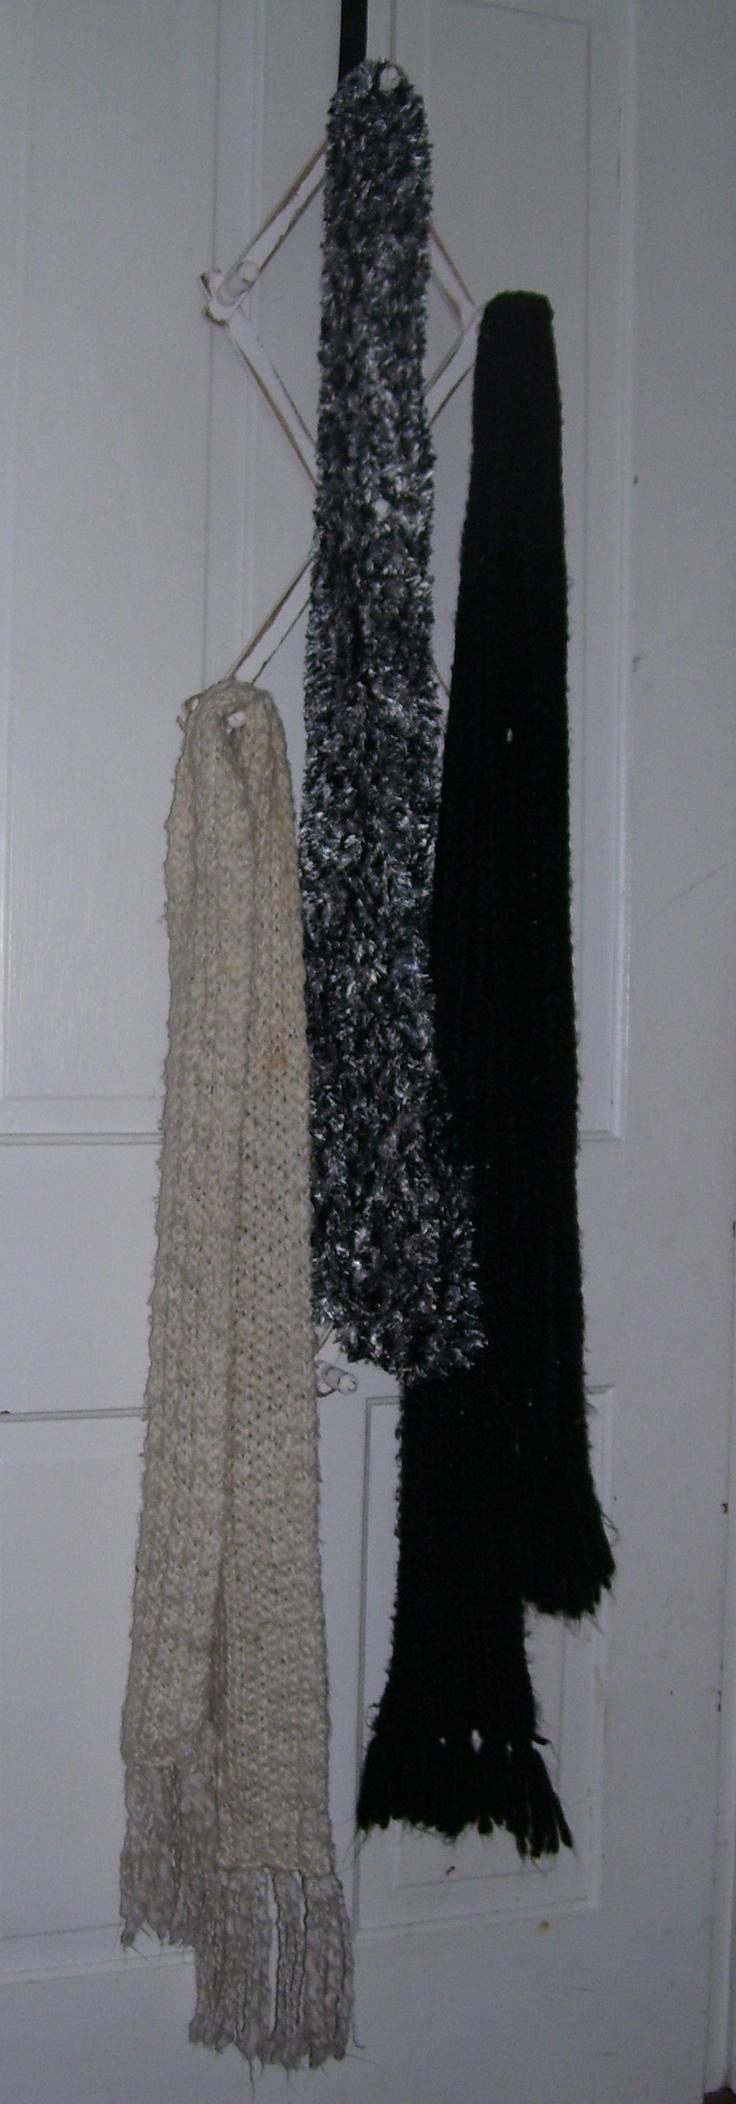 Best 20+ Scarf rack ideas on Pinterest   Tie hanger ideas ...